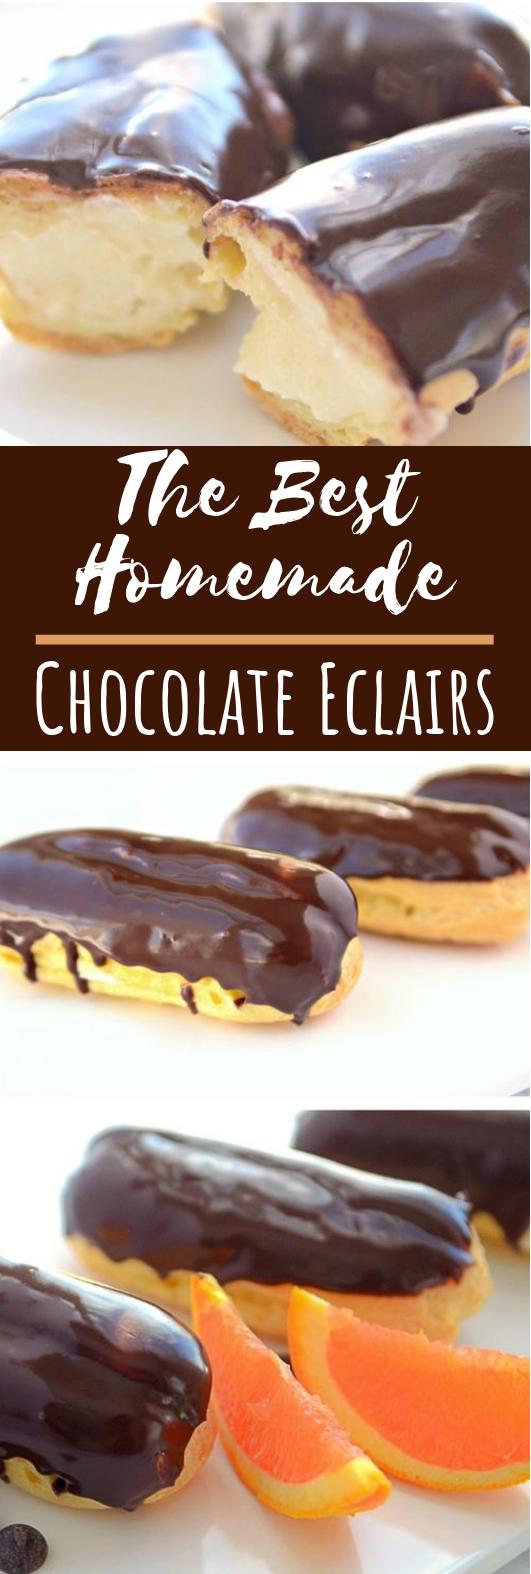 Chocolate Eclair #desserts #cake